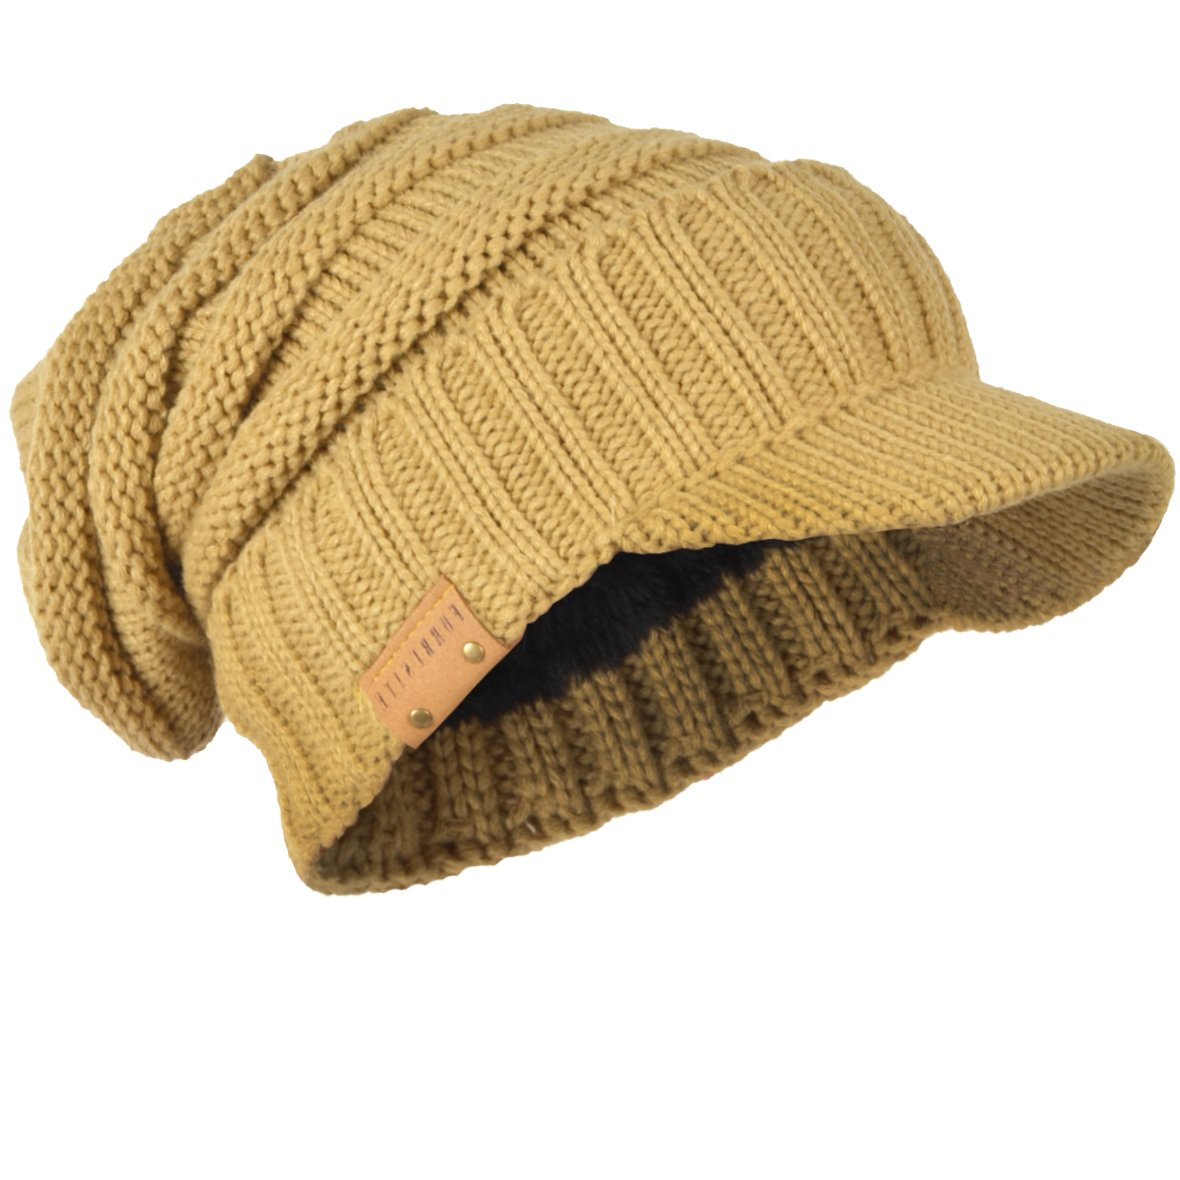 HISSHE Men\'s Thick Knit Newsboy Cap Visor Beanie Hat Fleece Lined Multicolor B319